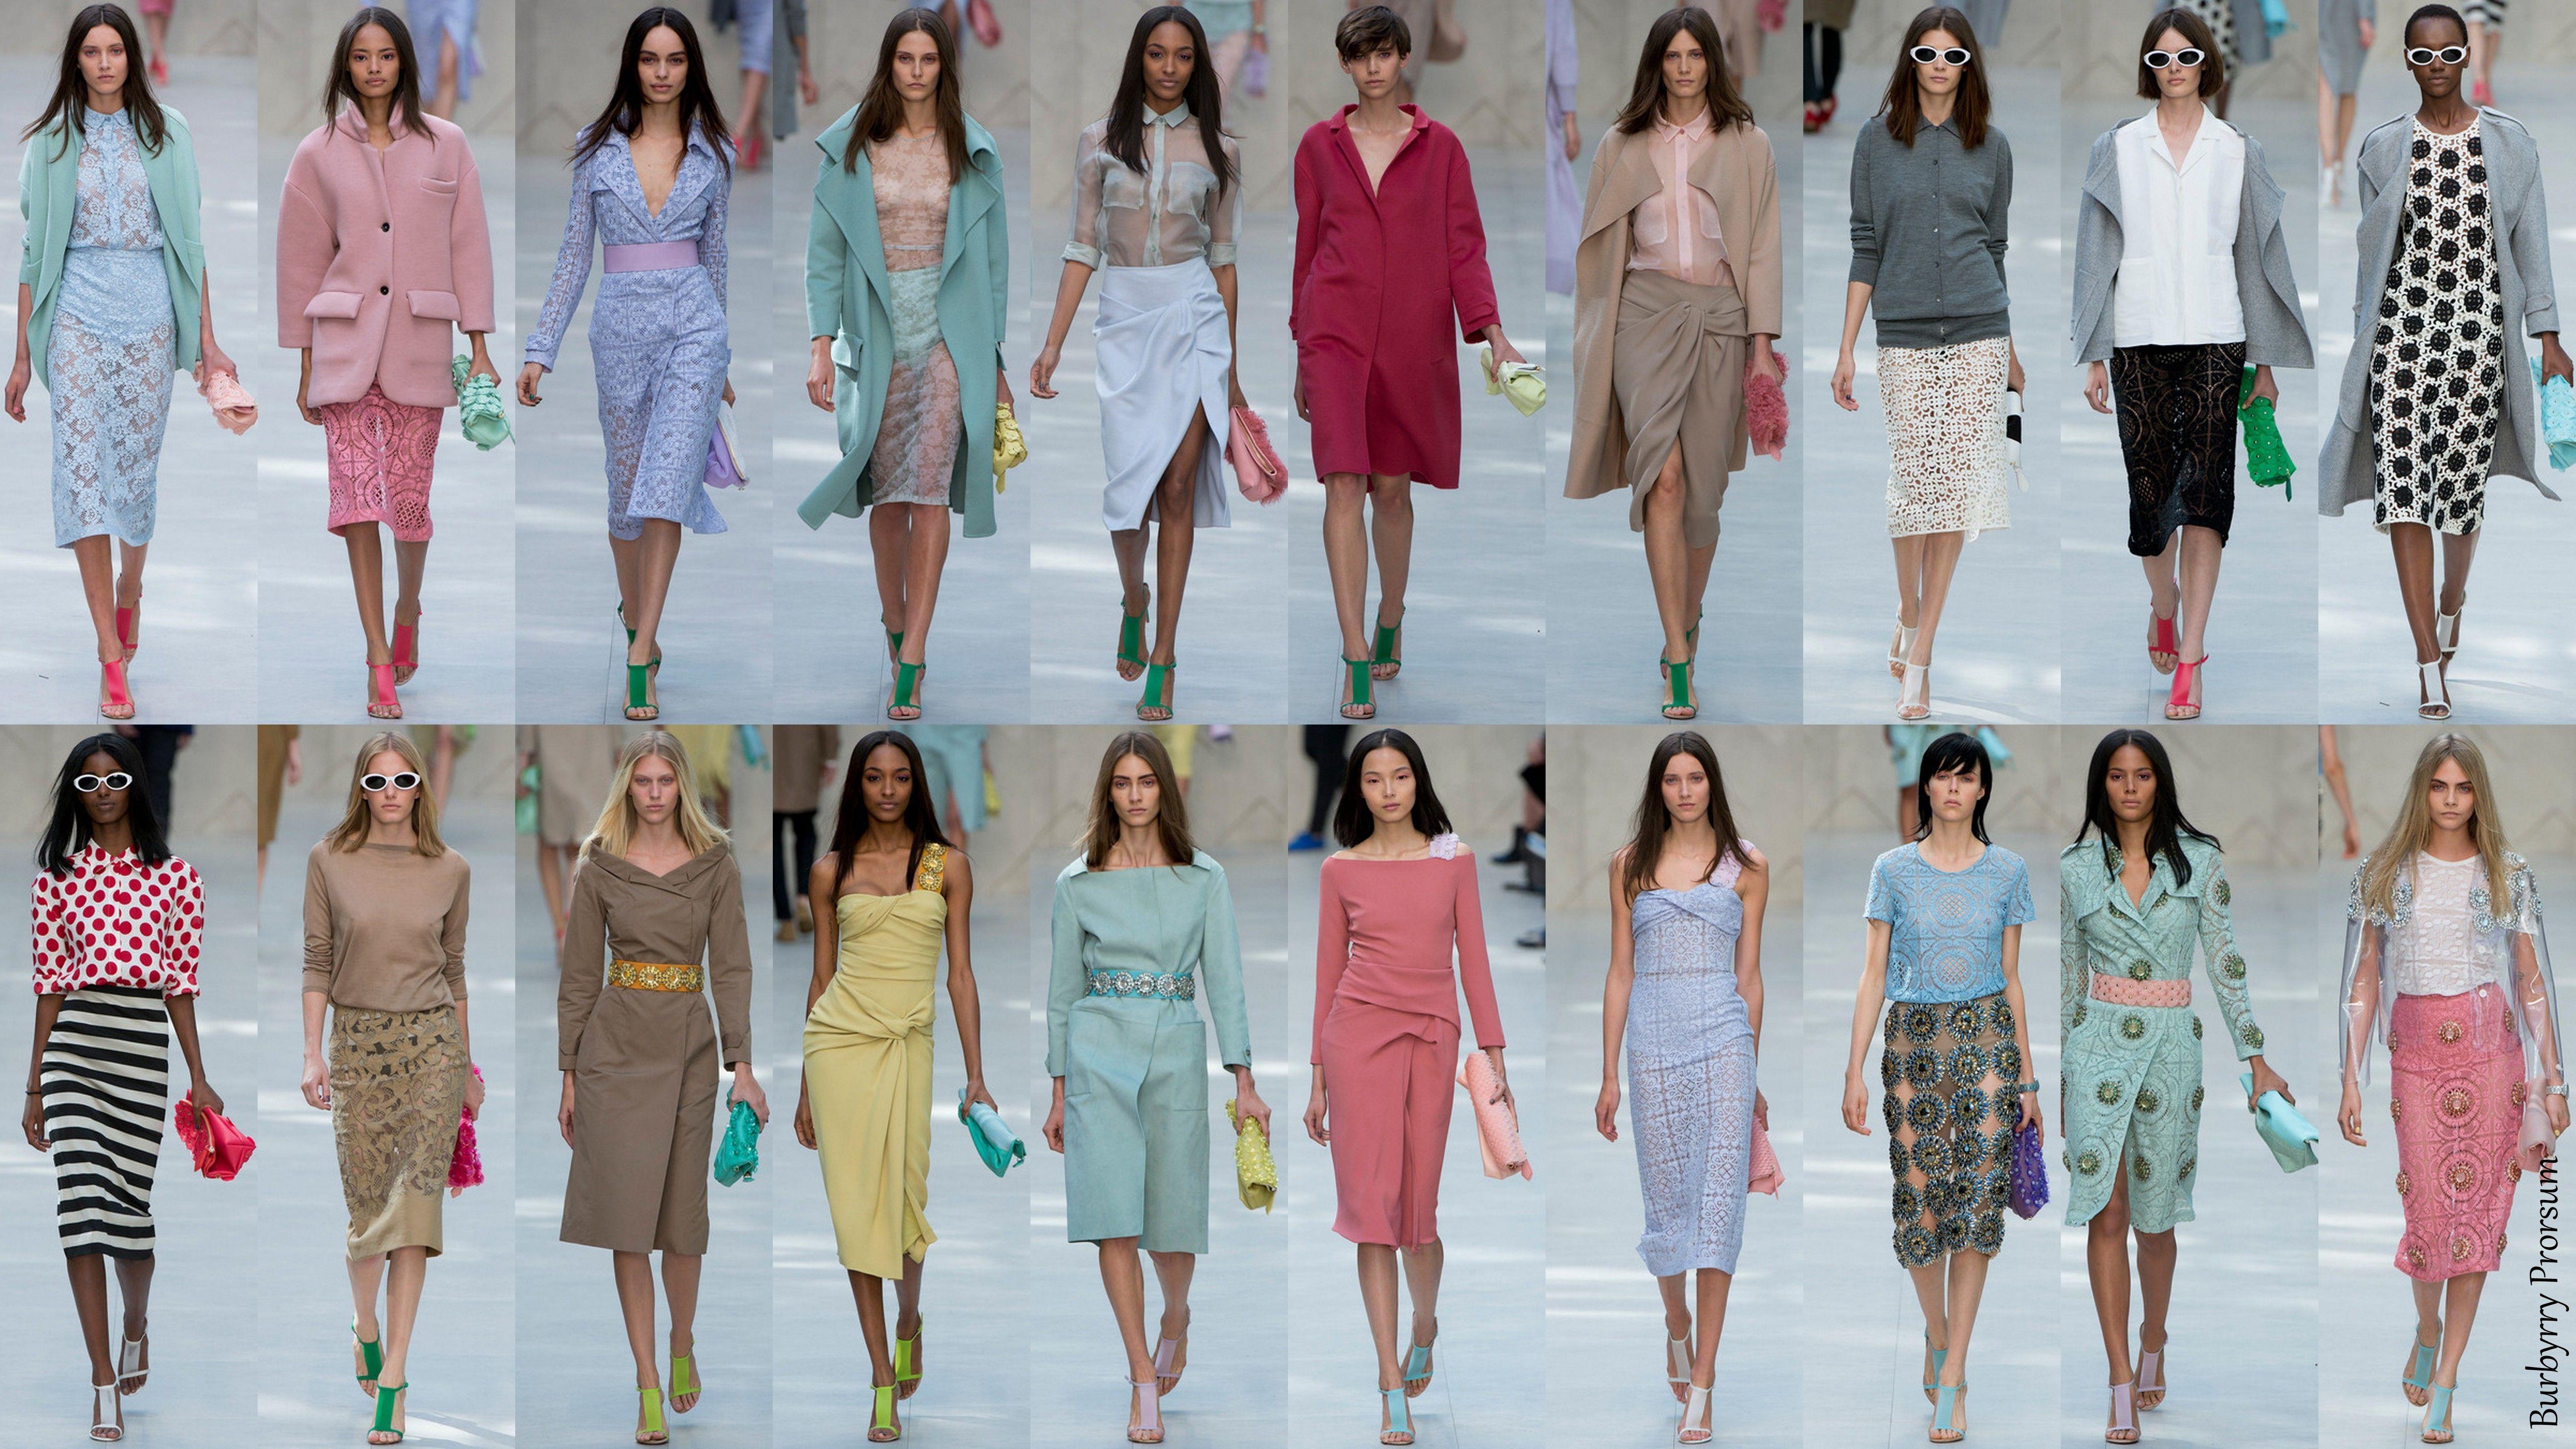 London Fashion Week Sprin/Summer 2014 - Burberry Prorsum